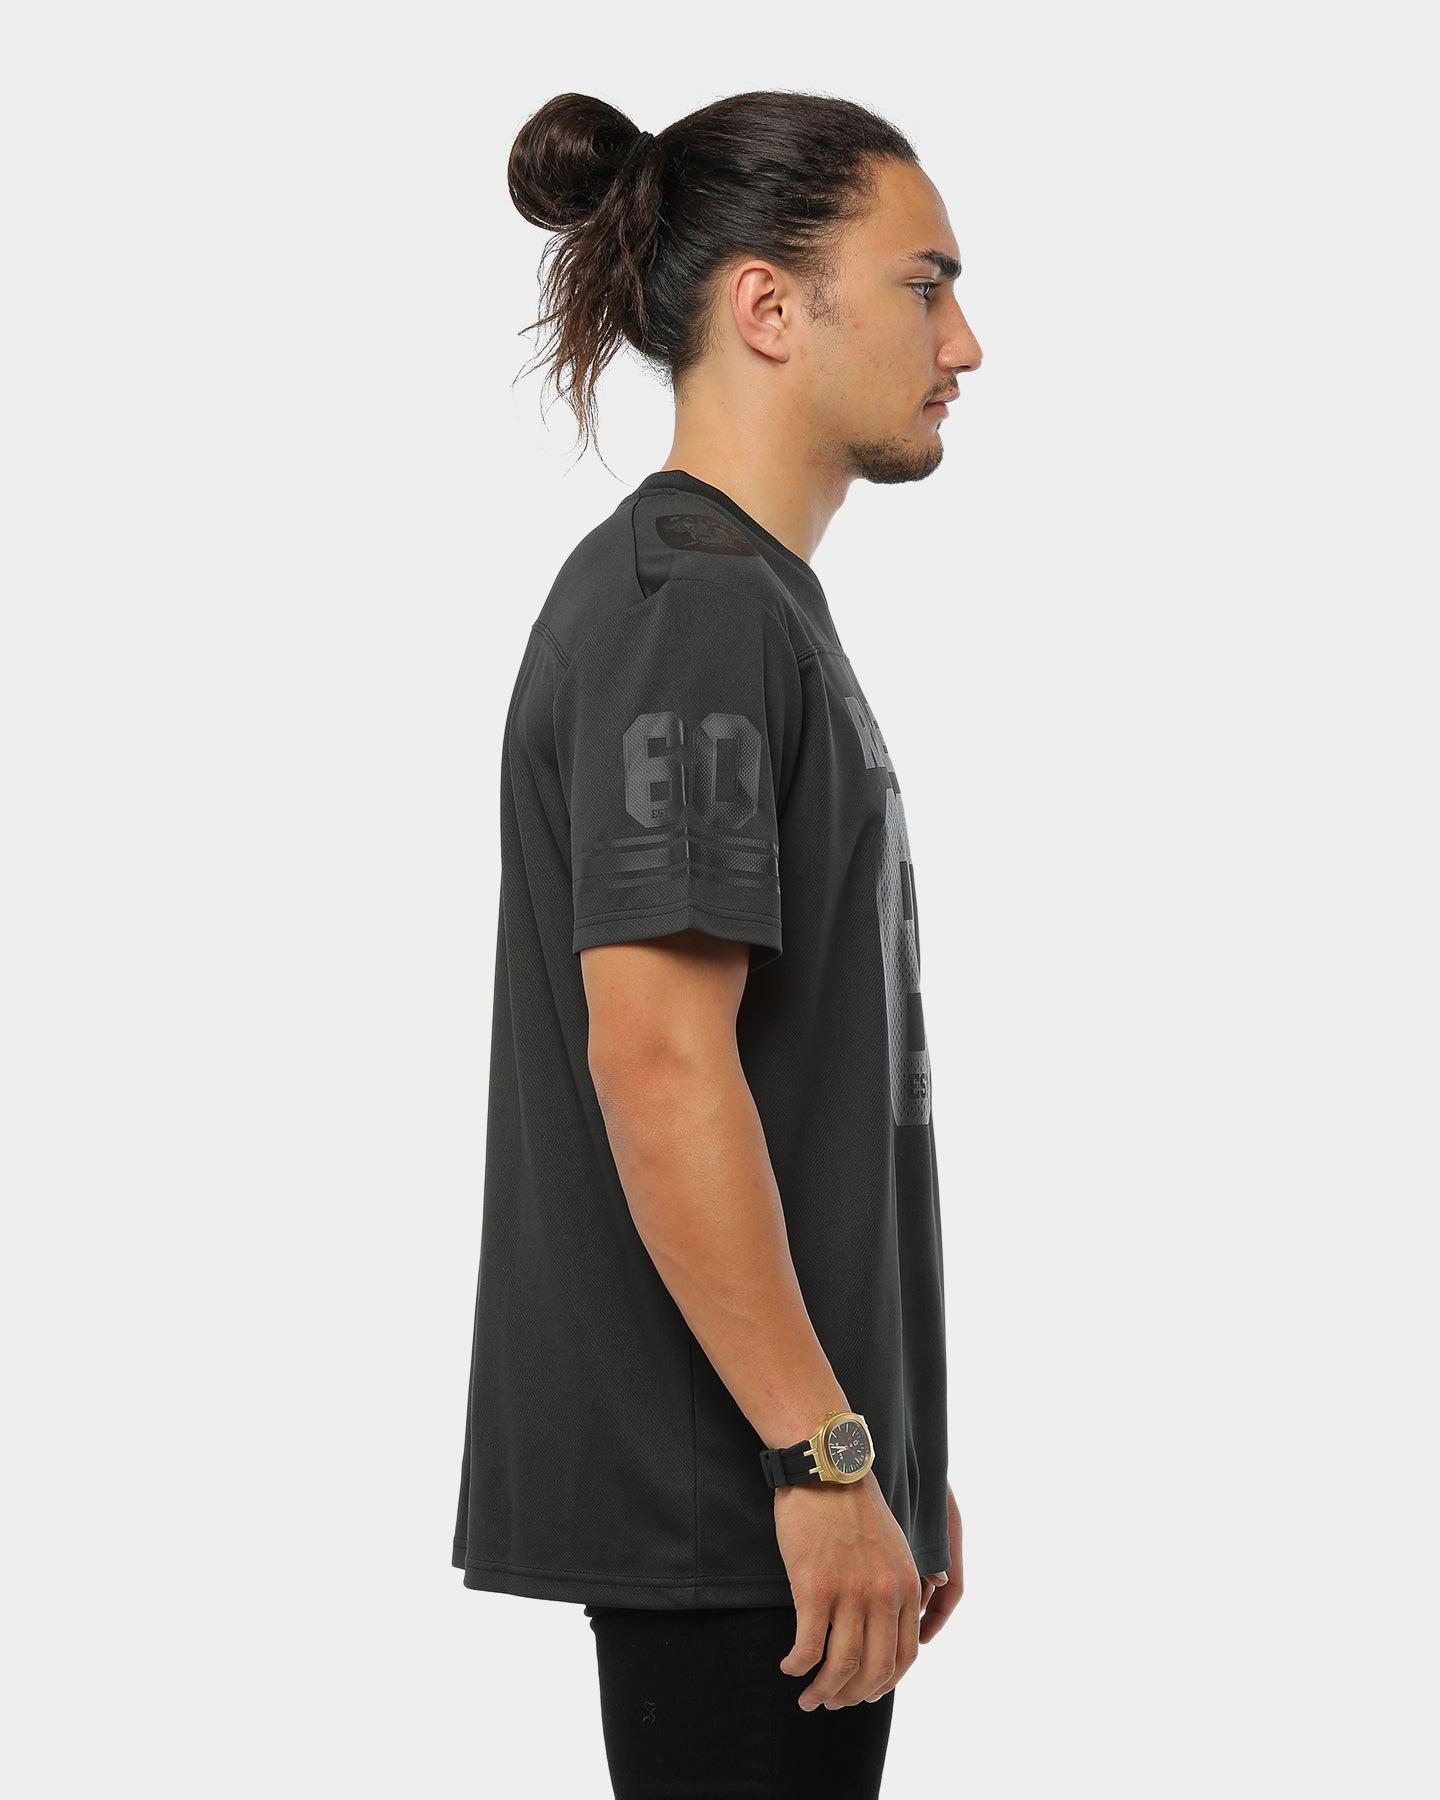 NFL Oakland Raiders Poly Mesh T Shirt Mens M L XL 2XL Jersey